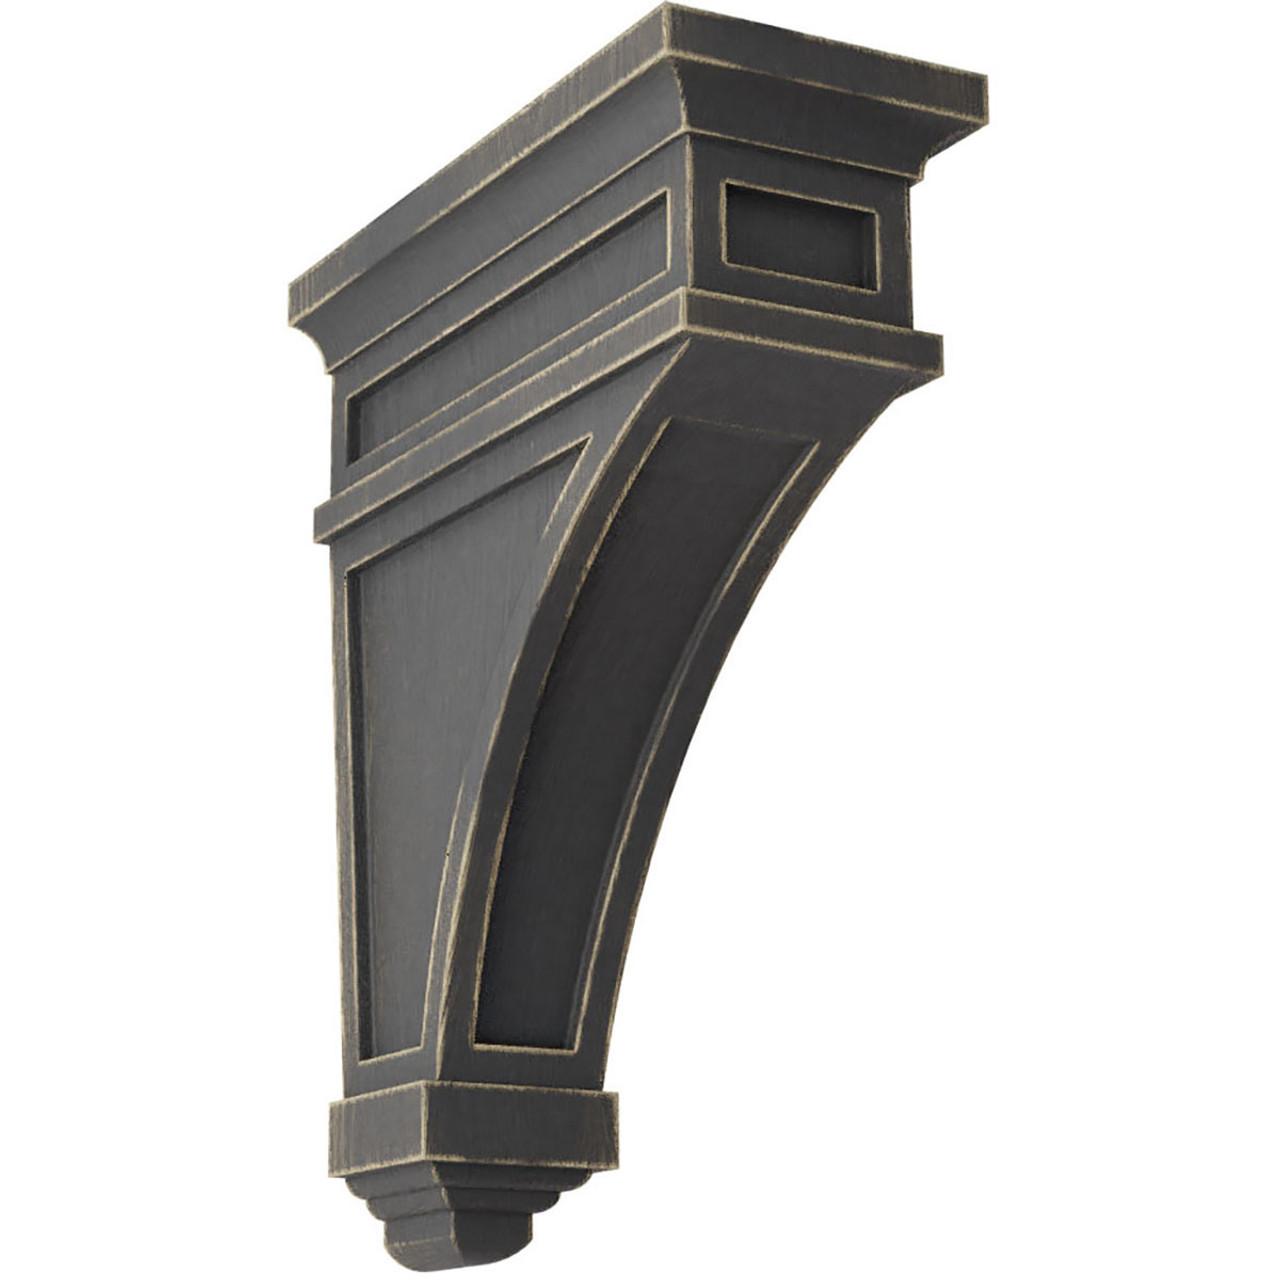 "4""W x 4""D x 12""H Arts and Crafts Wood Vintage Decor Corbel Black"